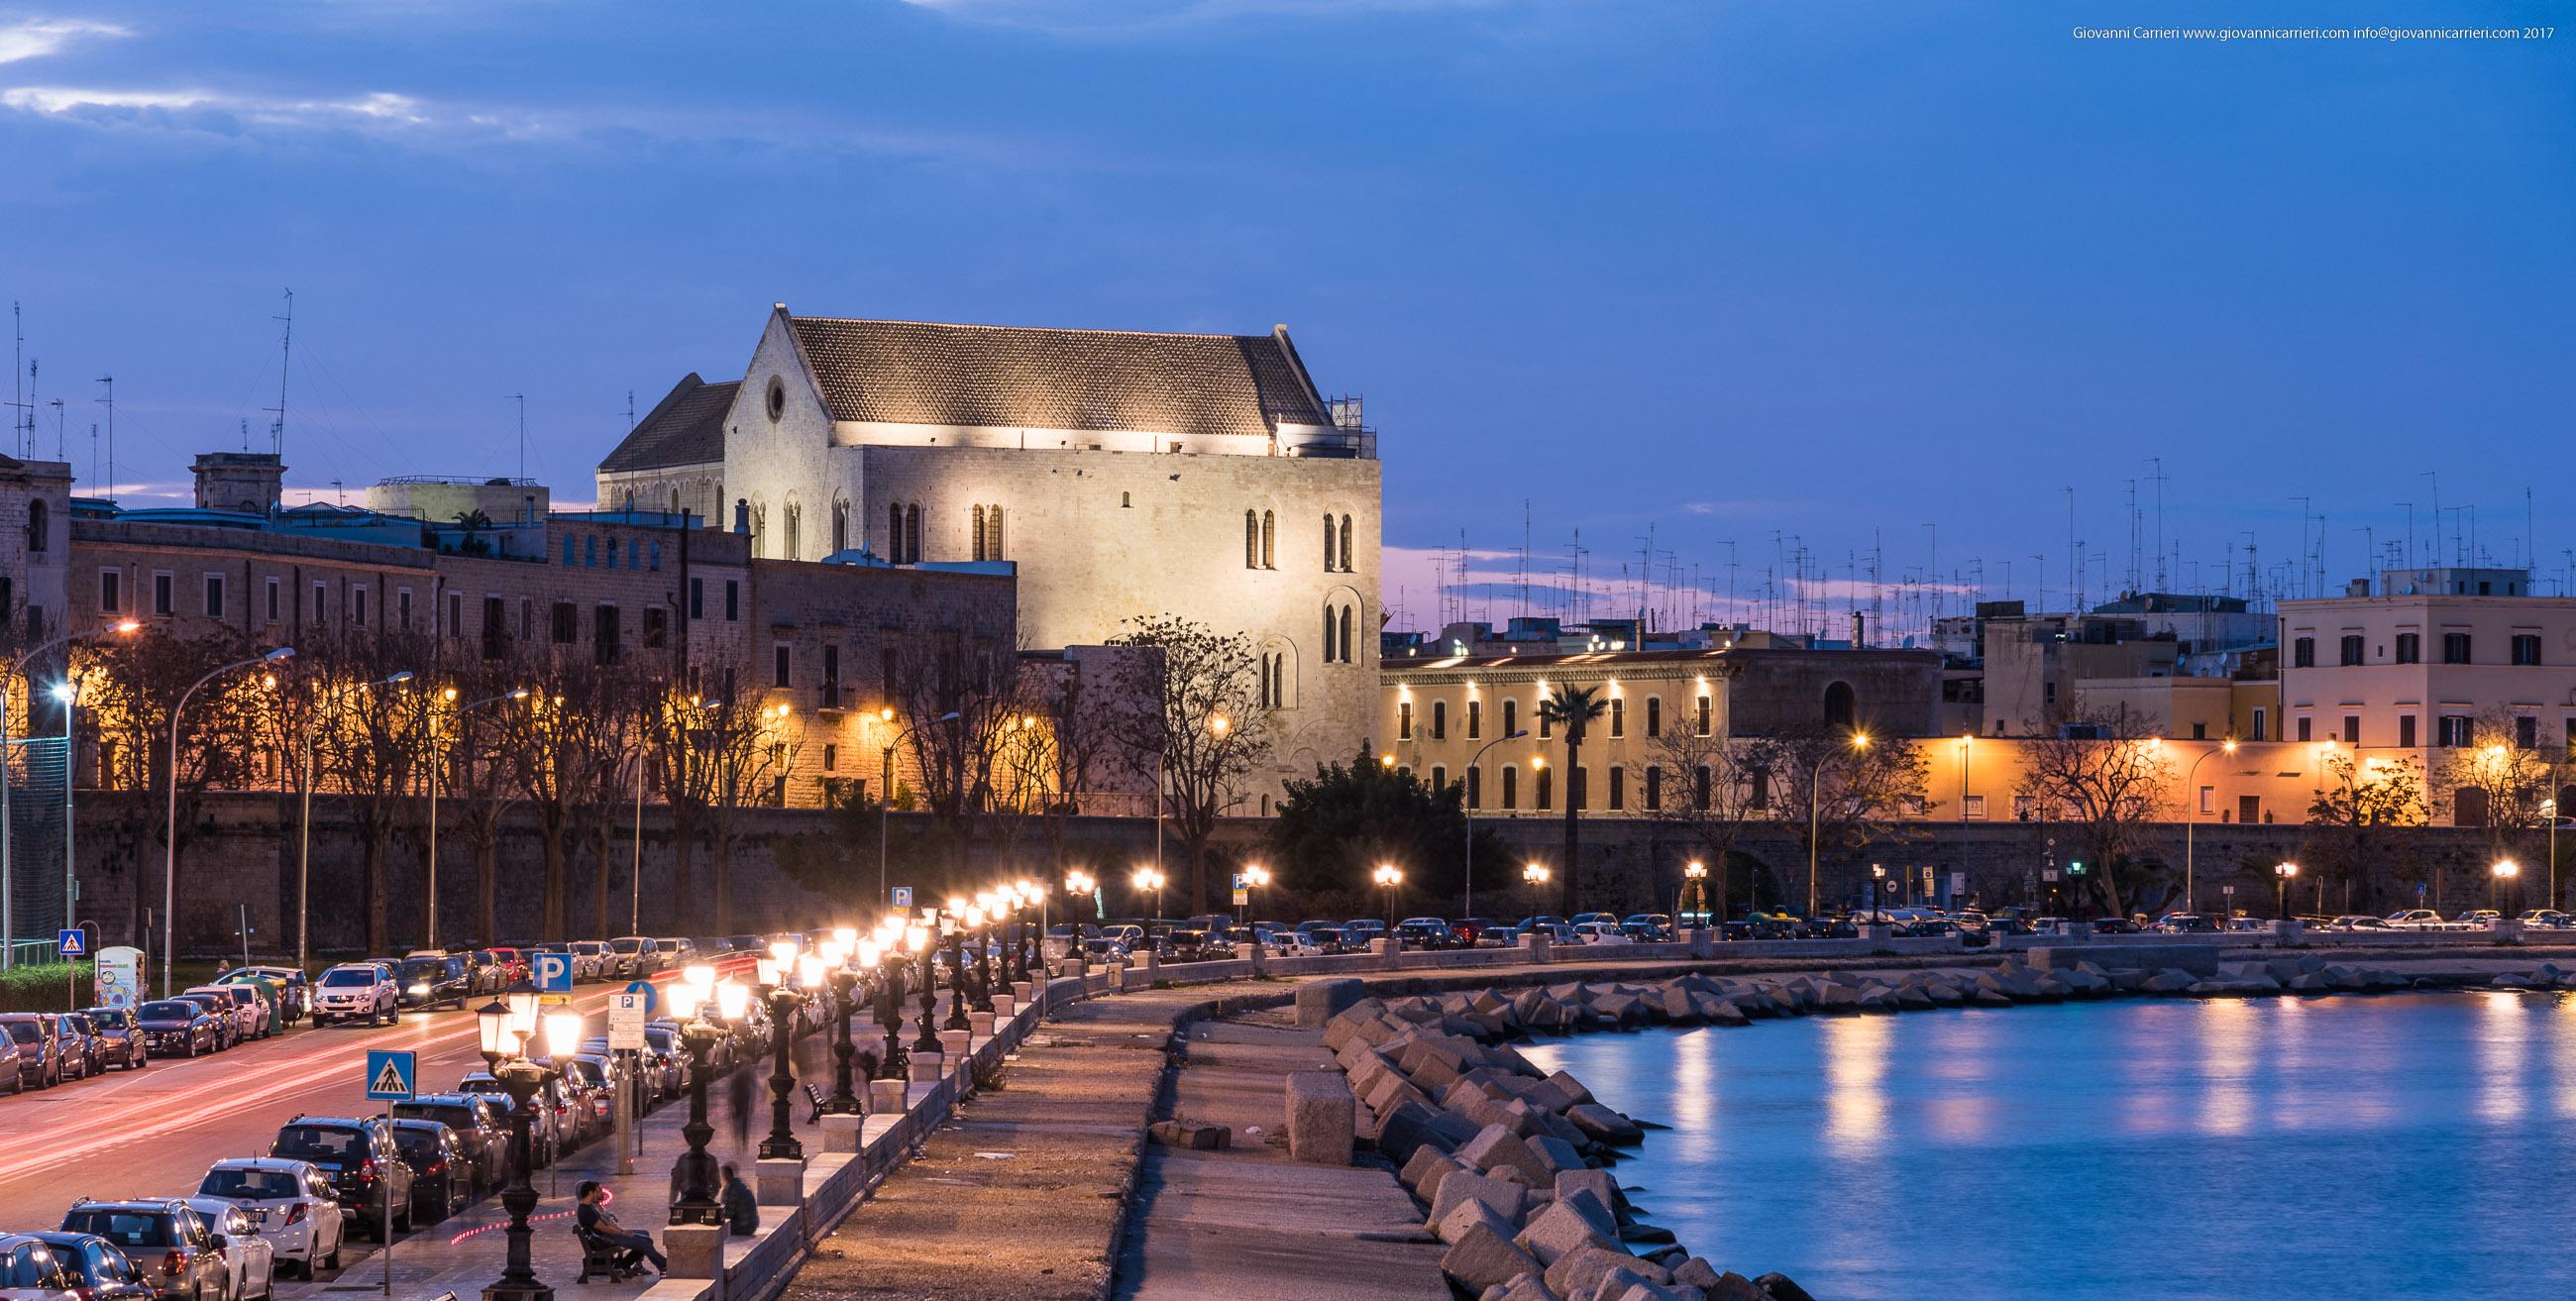 Promenade of Emperor Augusto, Bari